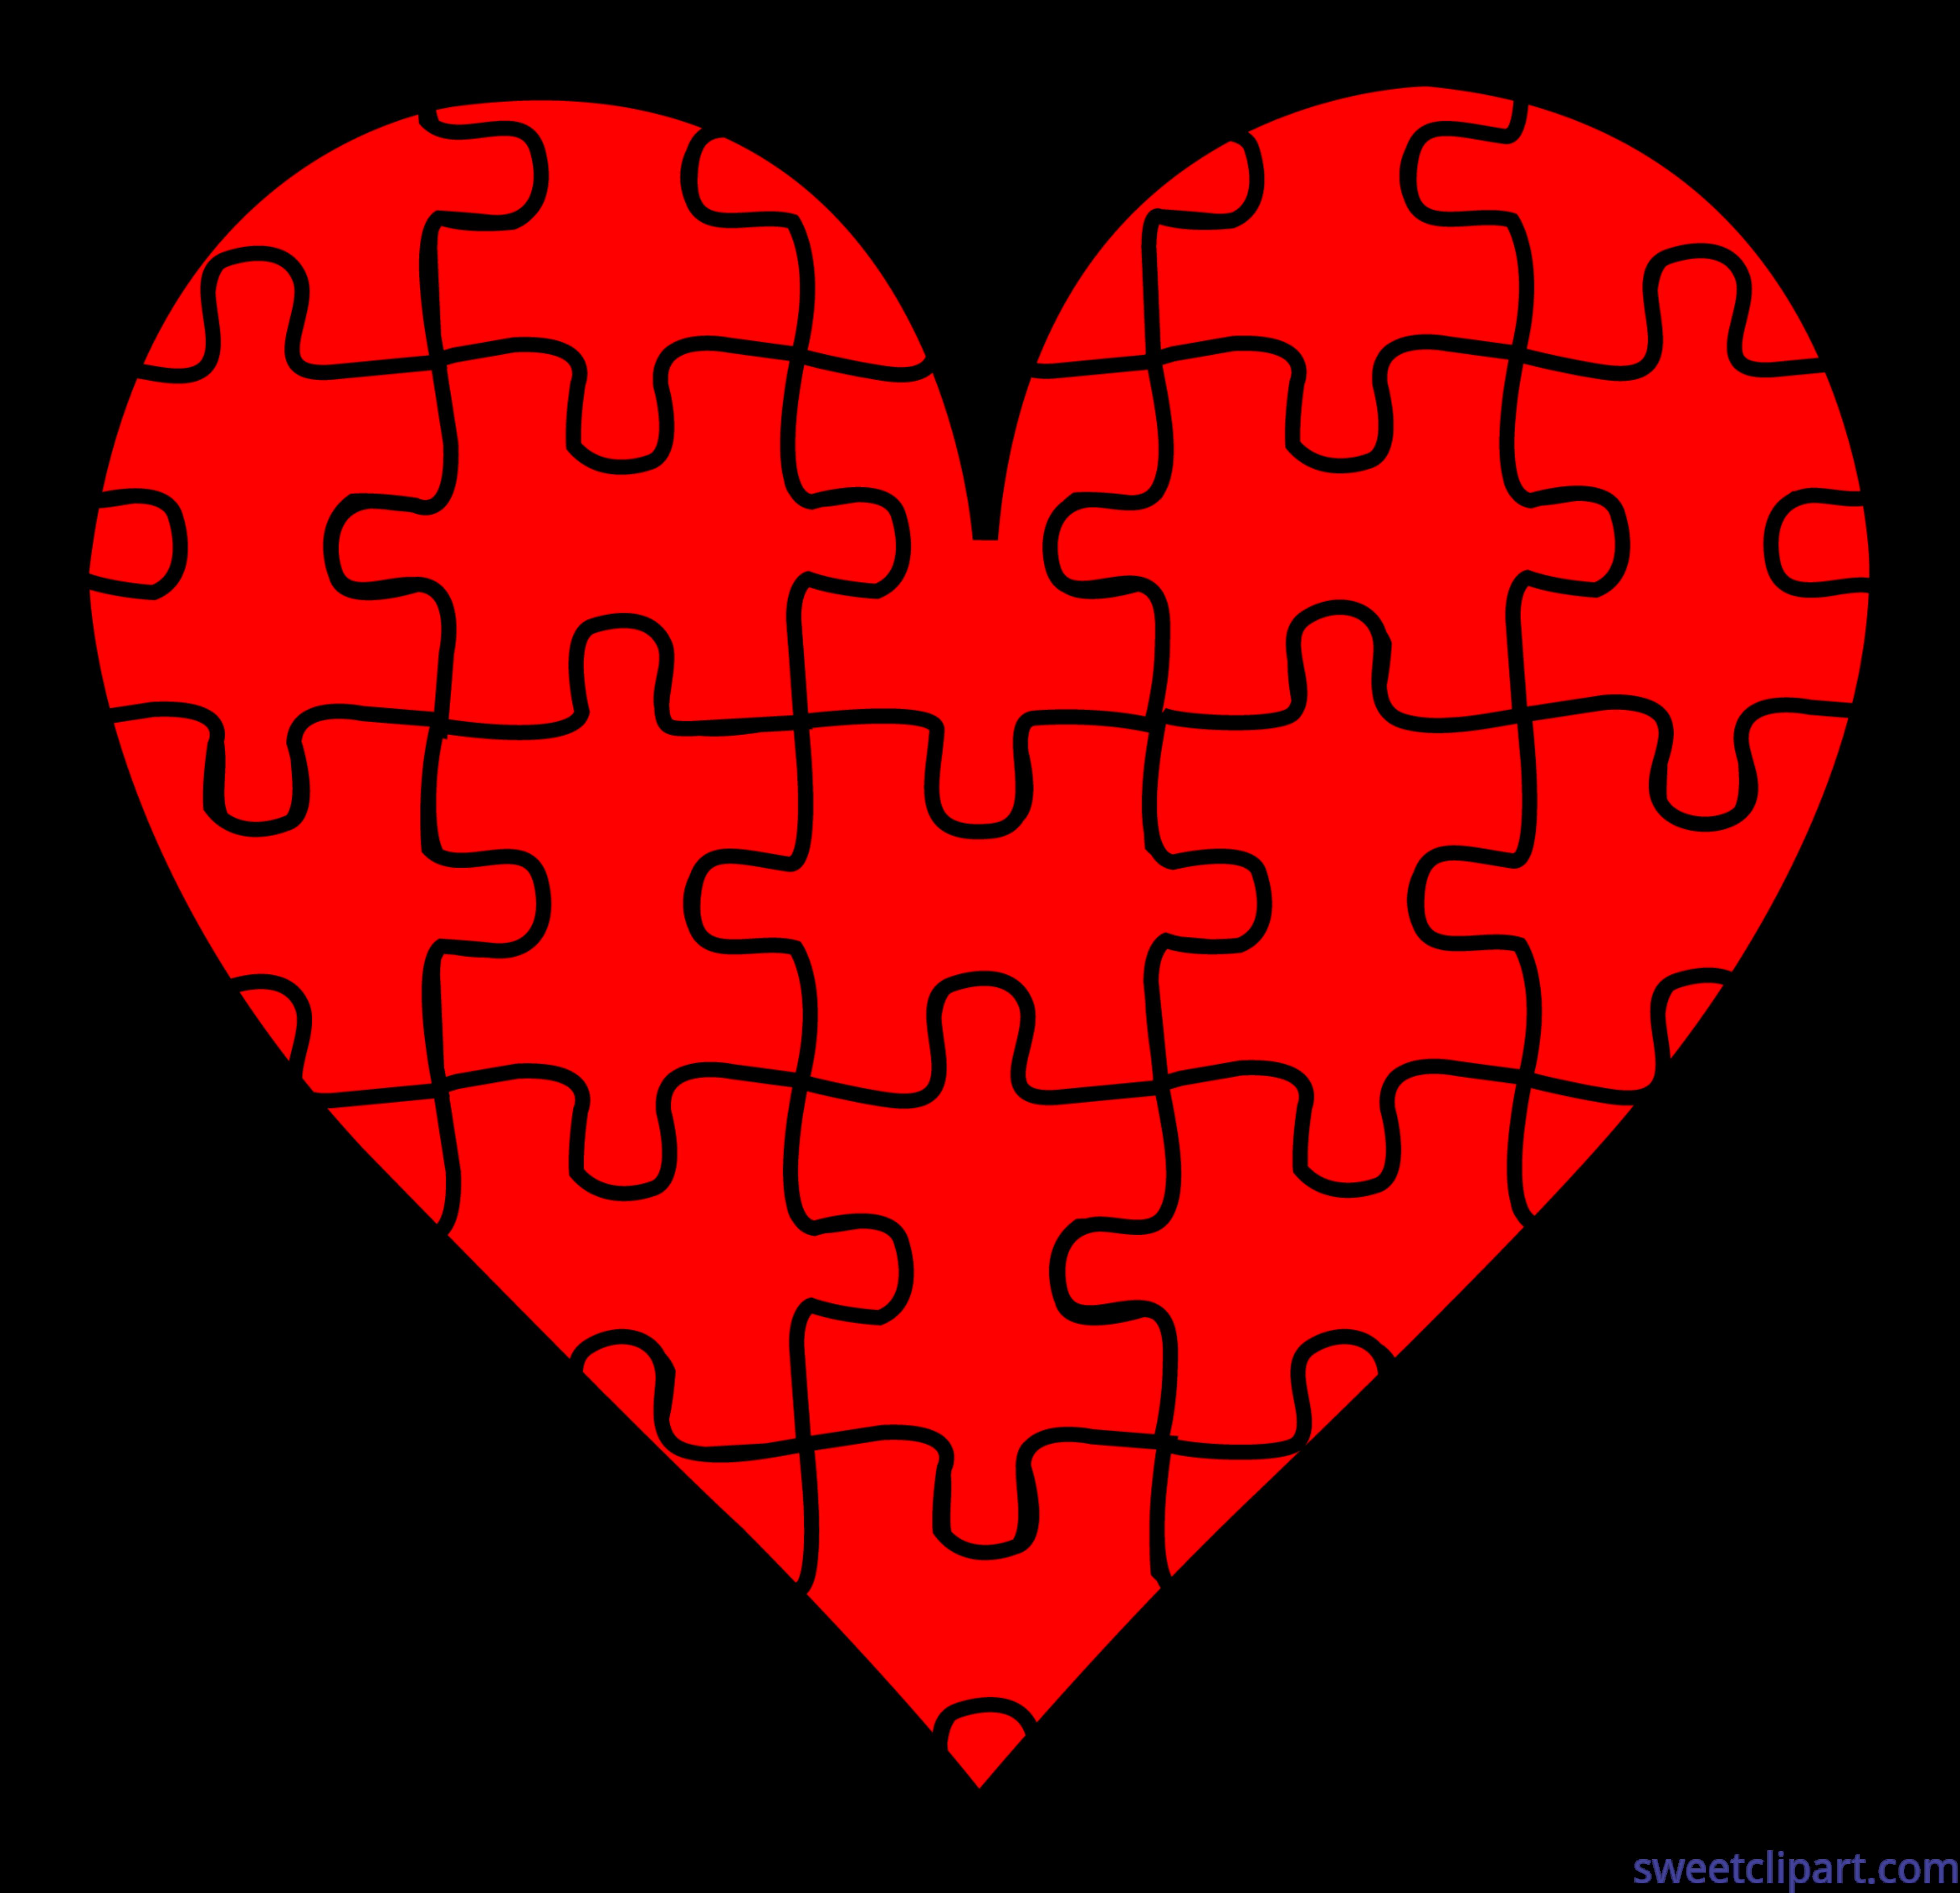 Mail clipart valentines. Symbols puzzle heart clip